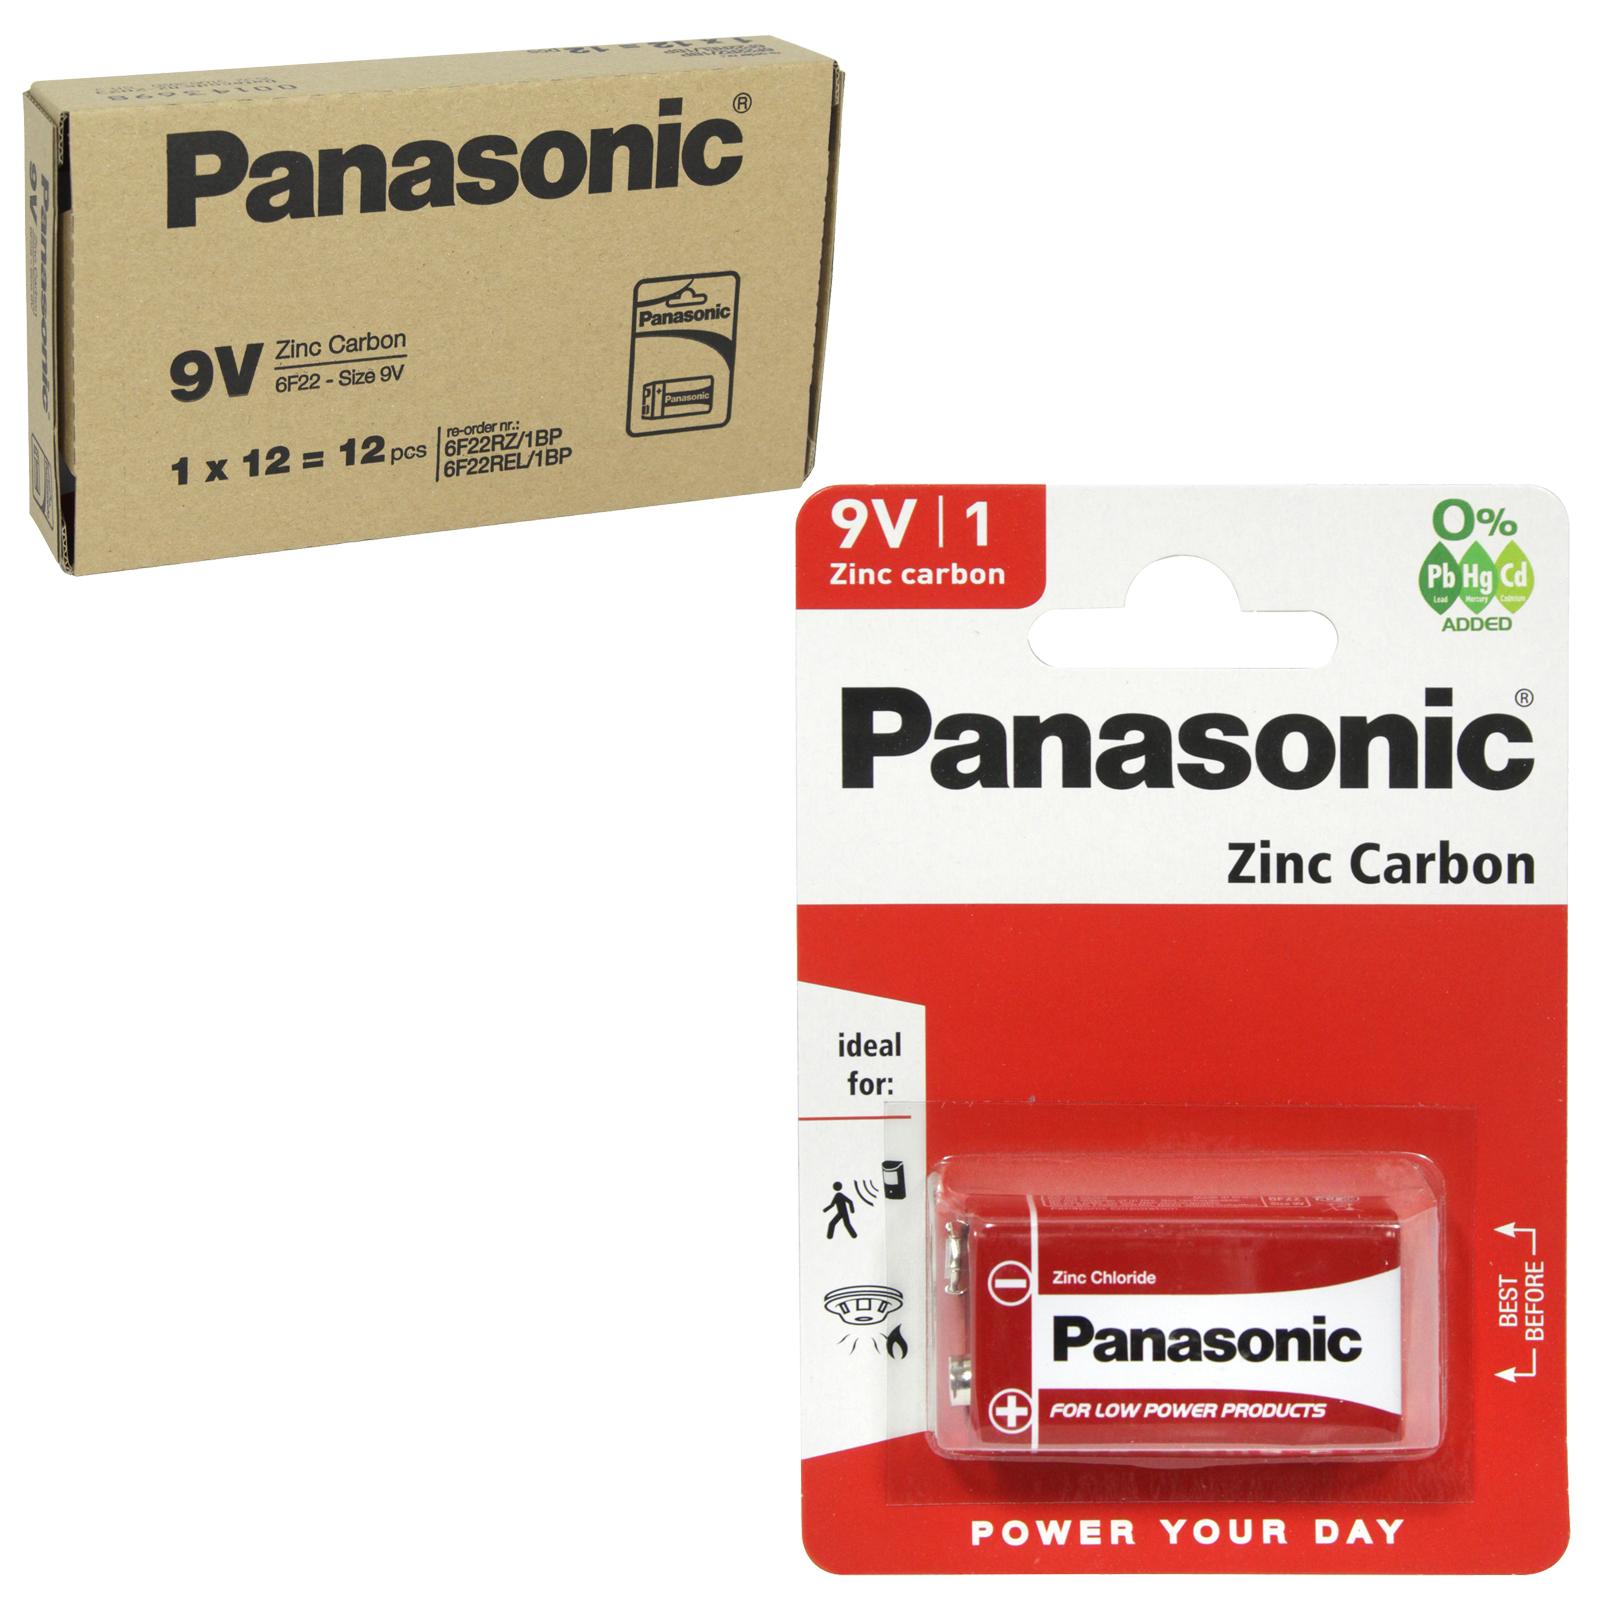 PANASONIC BATTERIES ZINC 6F22RZ 9V-PP3 X12